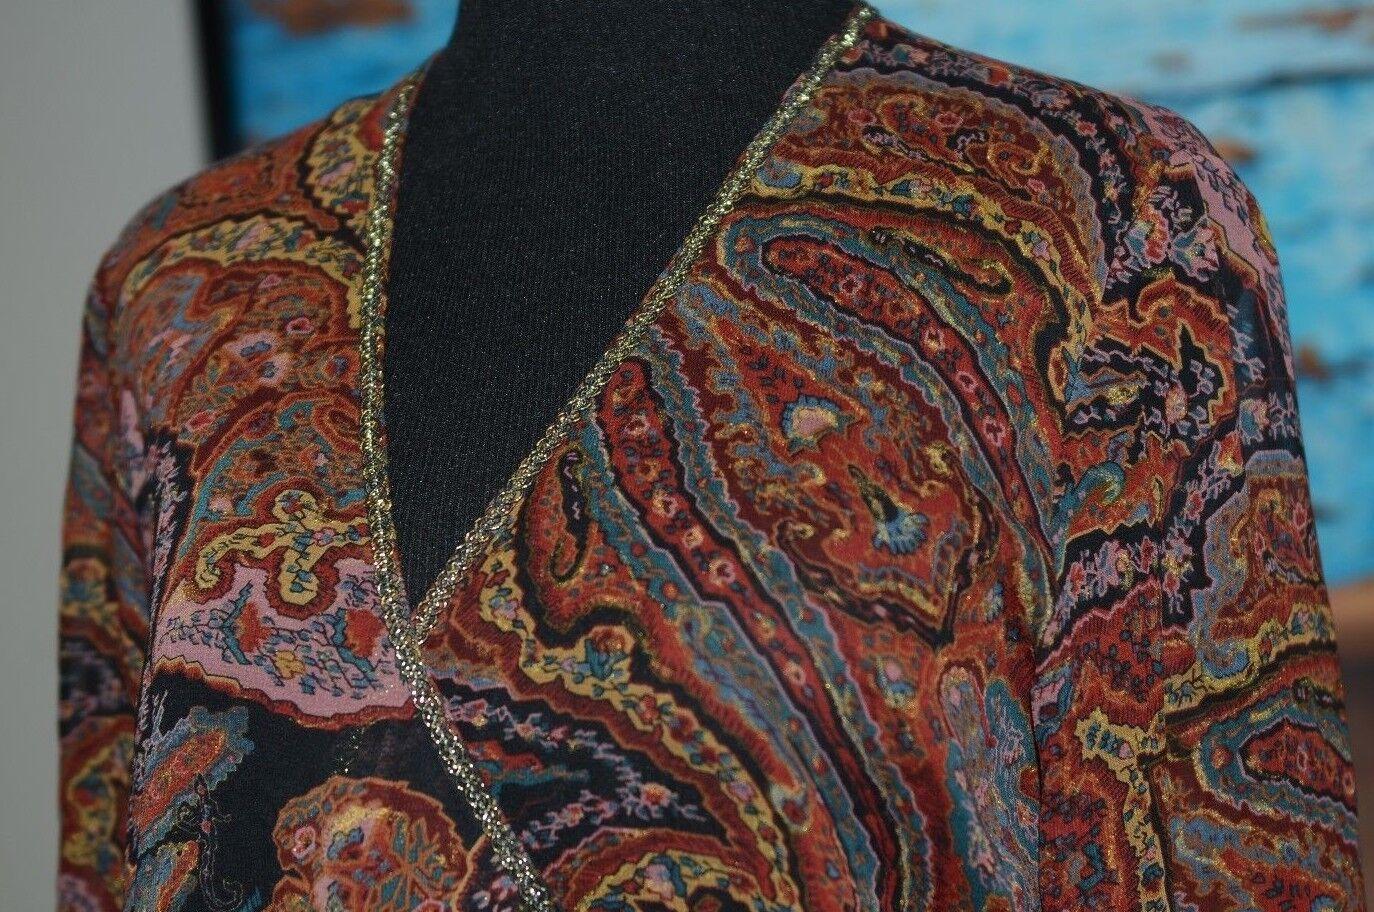 Ralph Lauren Größe 4 Silk Wrap Around Blouse Bow V Neck Shirt Shimmer Sheer braun